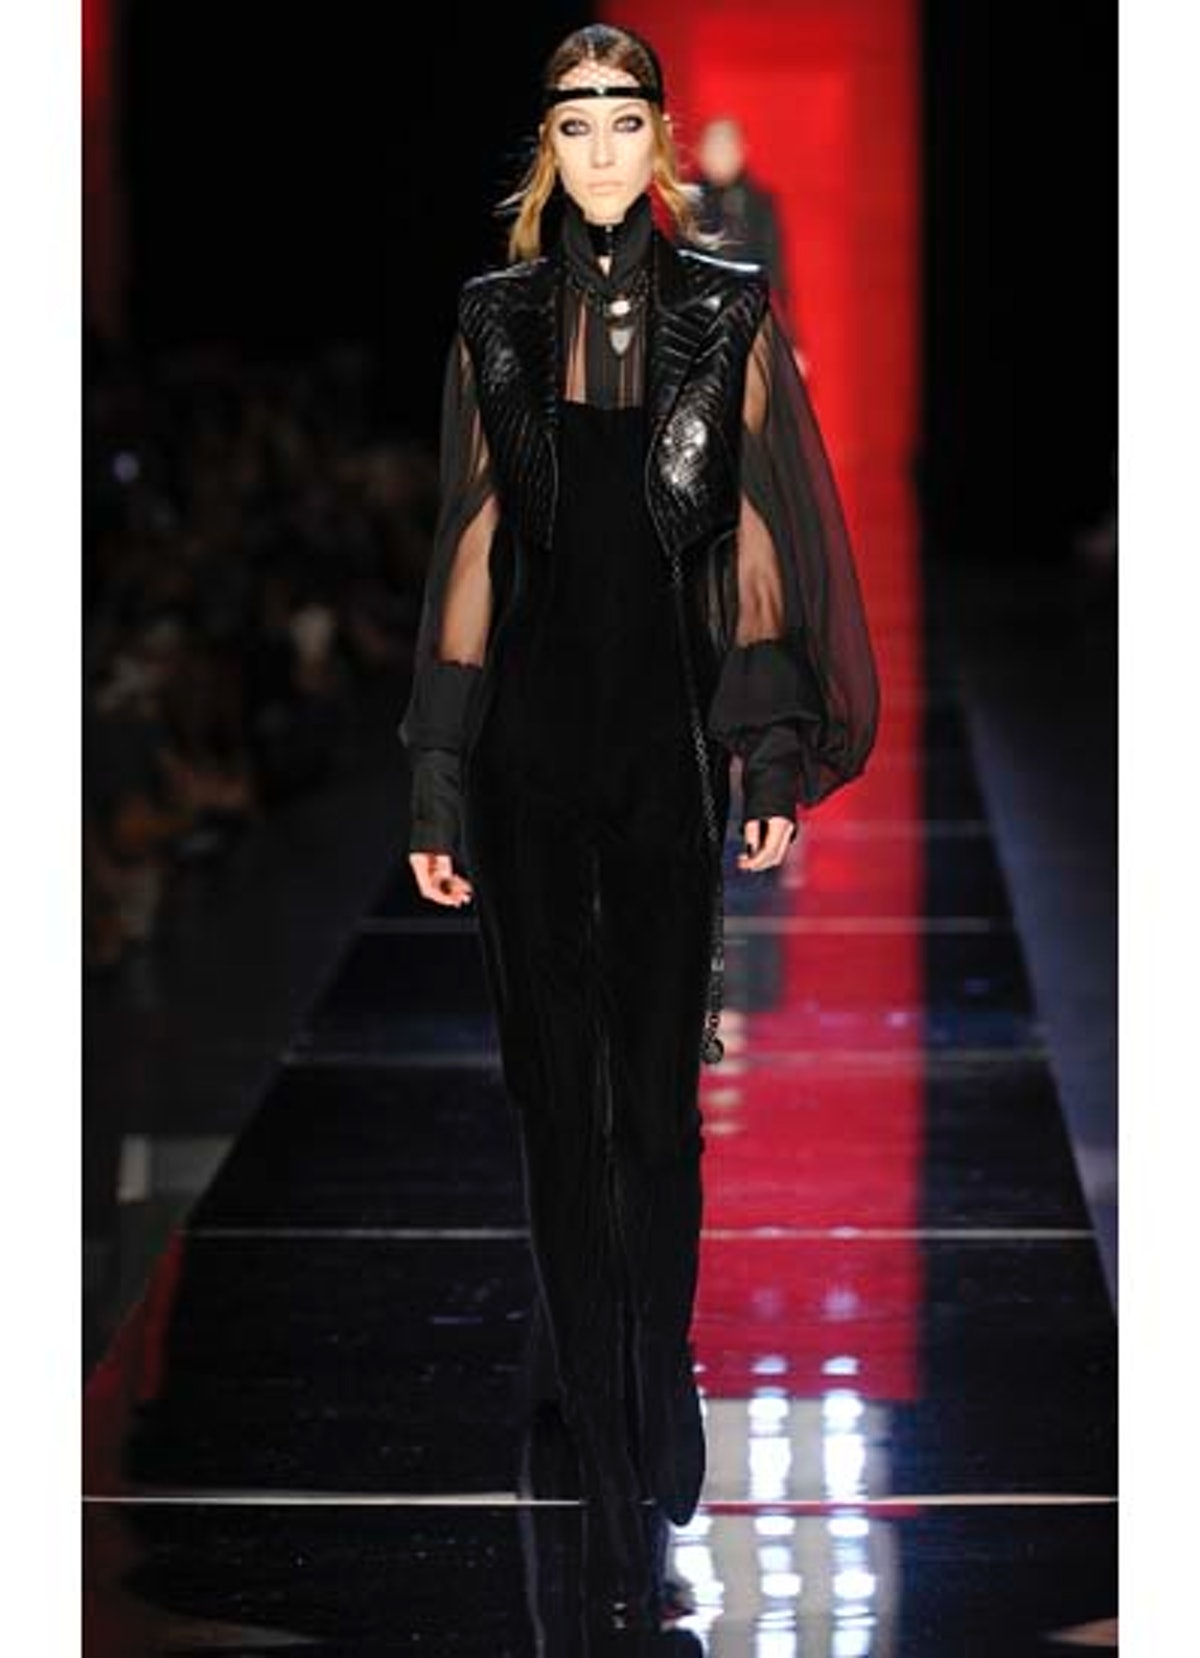 fass-jean-paul-gaultier-couture-2012-runway-09-v.jpg